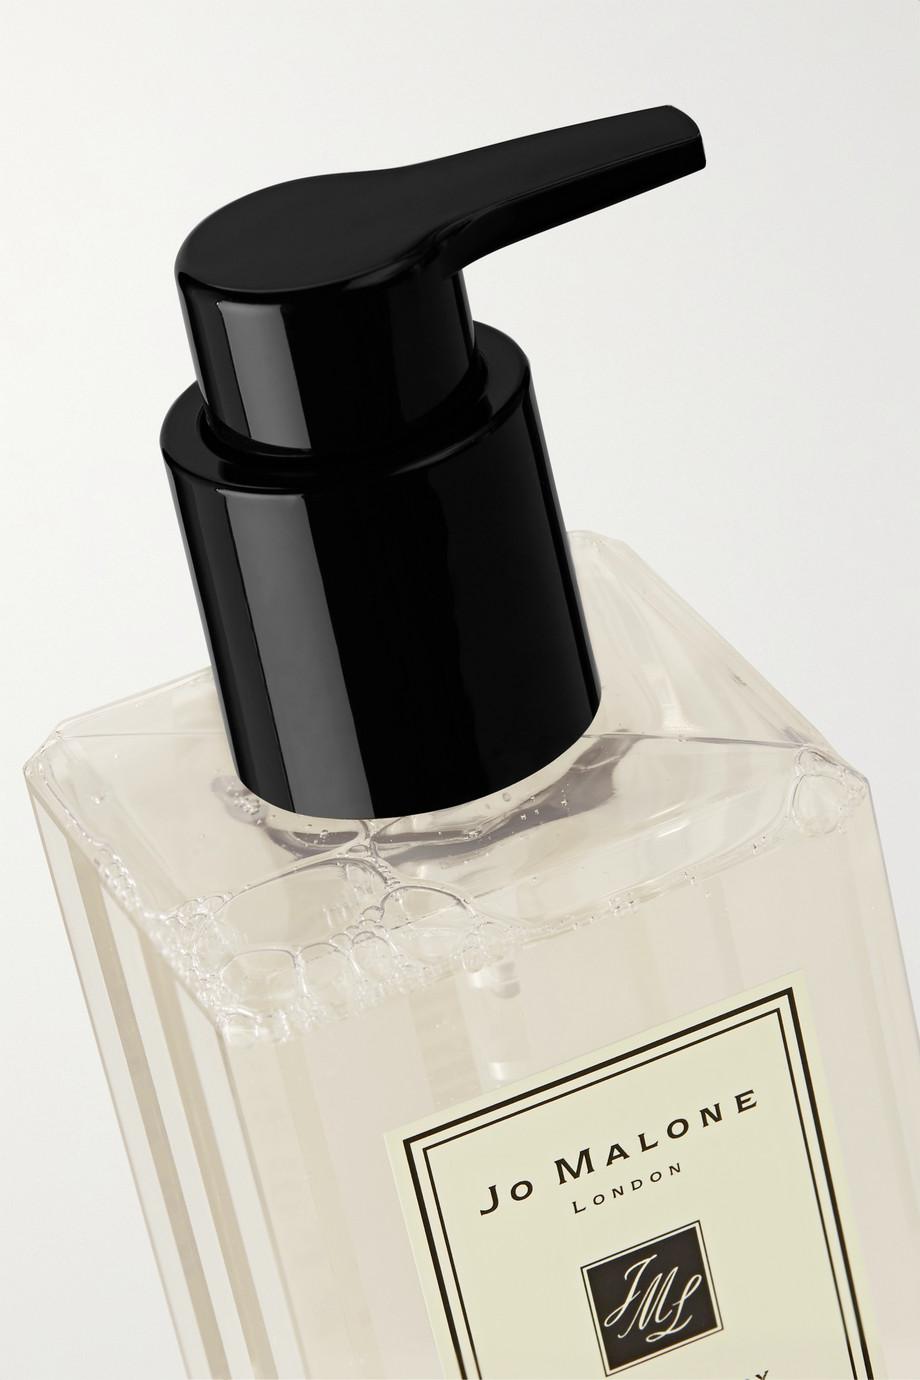 Jo Malone London Wood Sage & Sea Salt Body & Hand Wash, 250ml